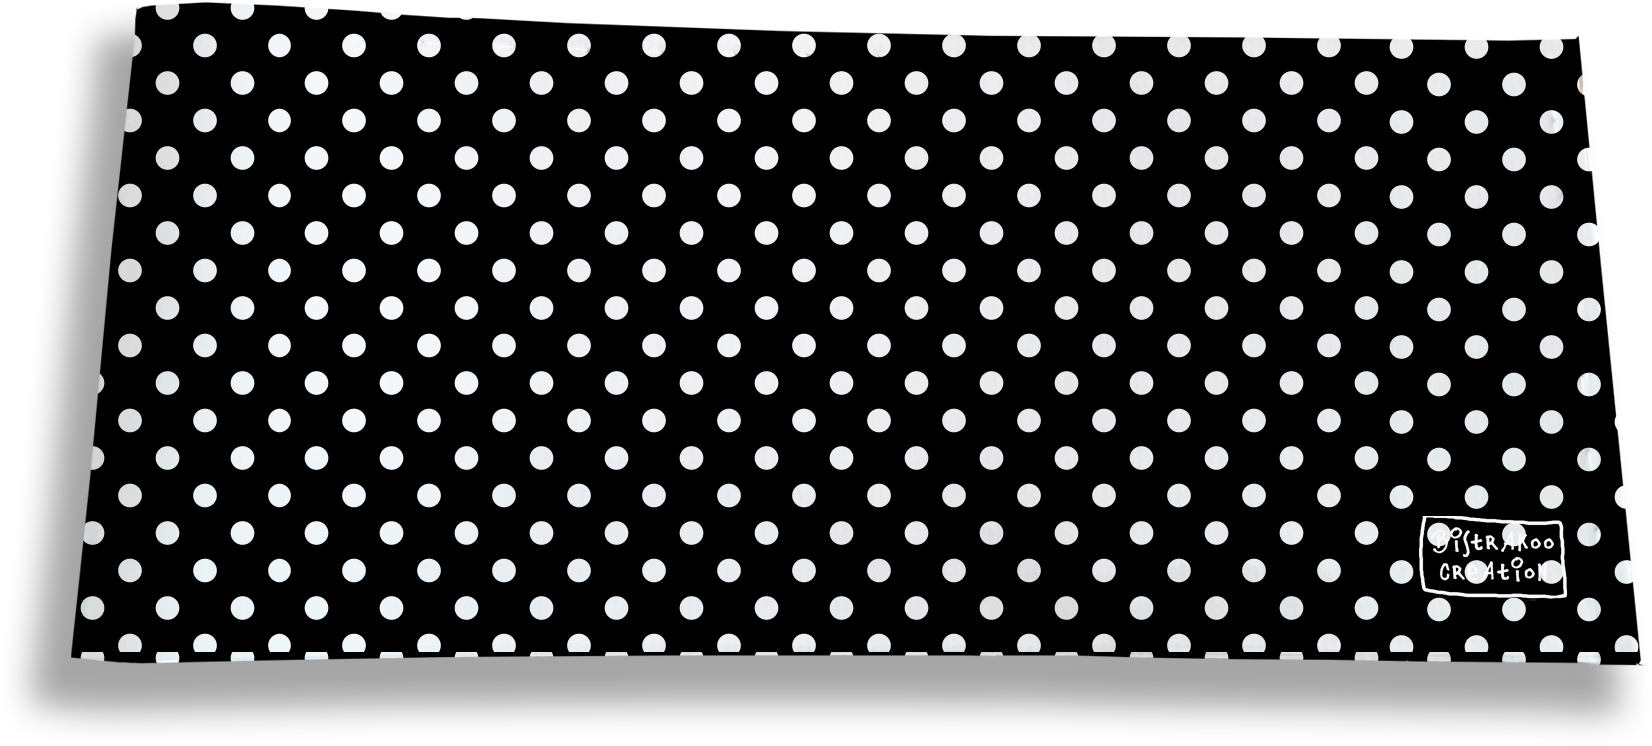 Porte-chéquier long horizontal motif Pois blancs fond noir 2011